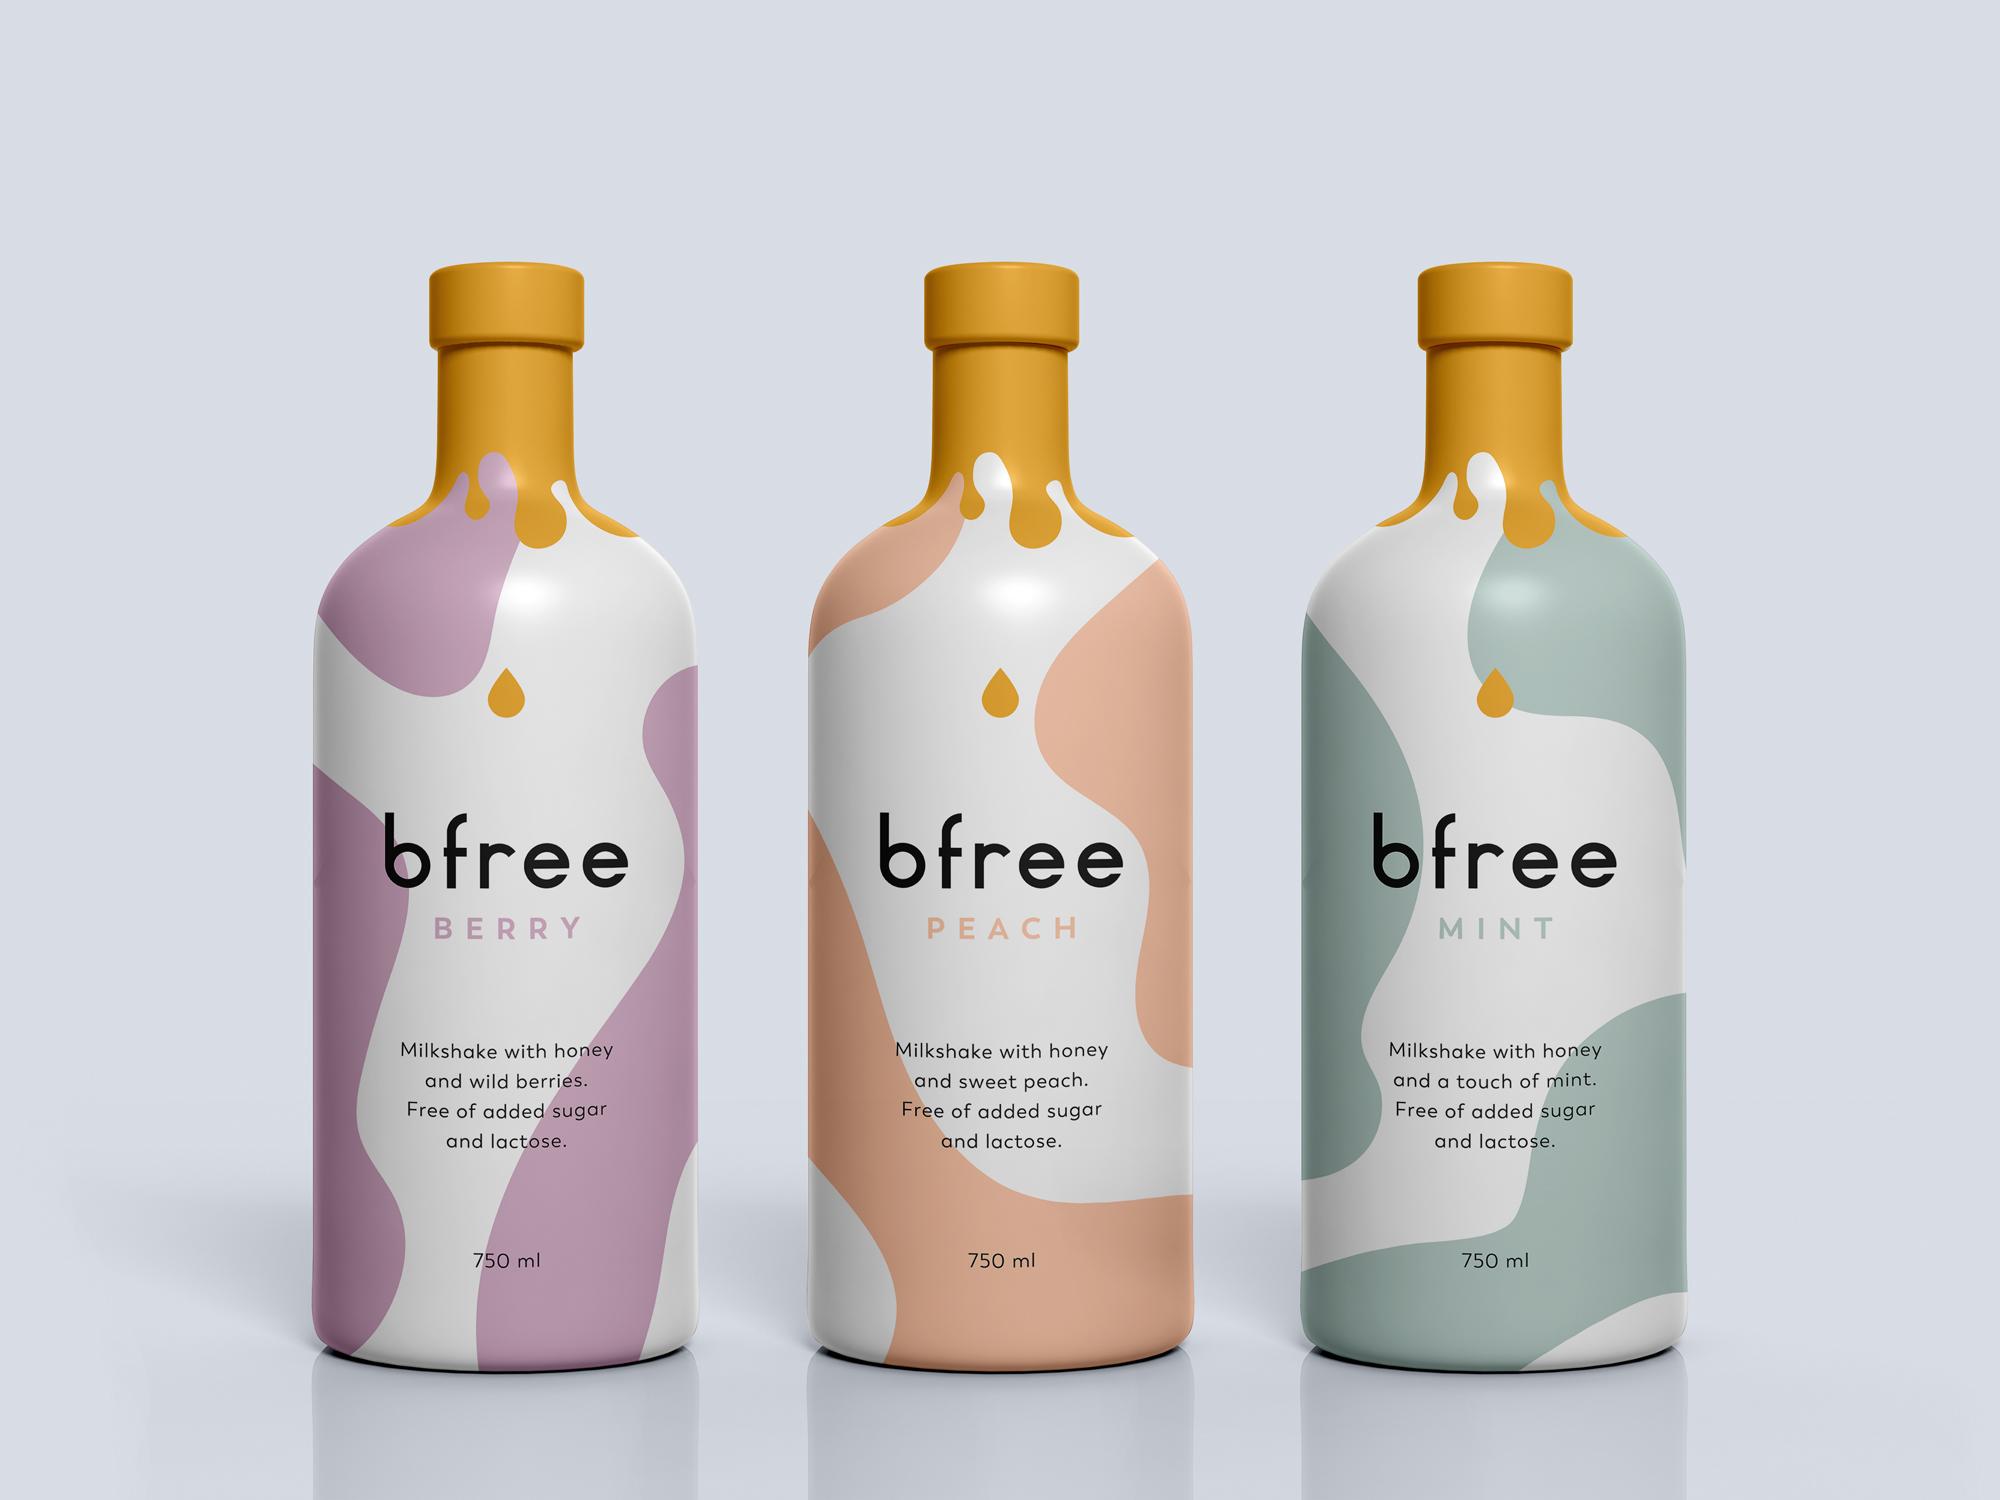 bfree - milkshake